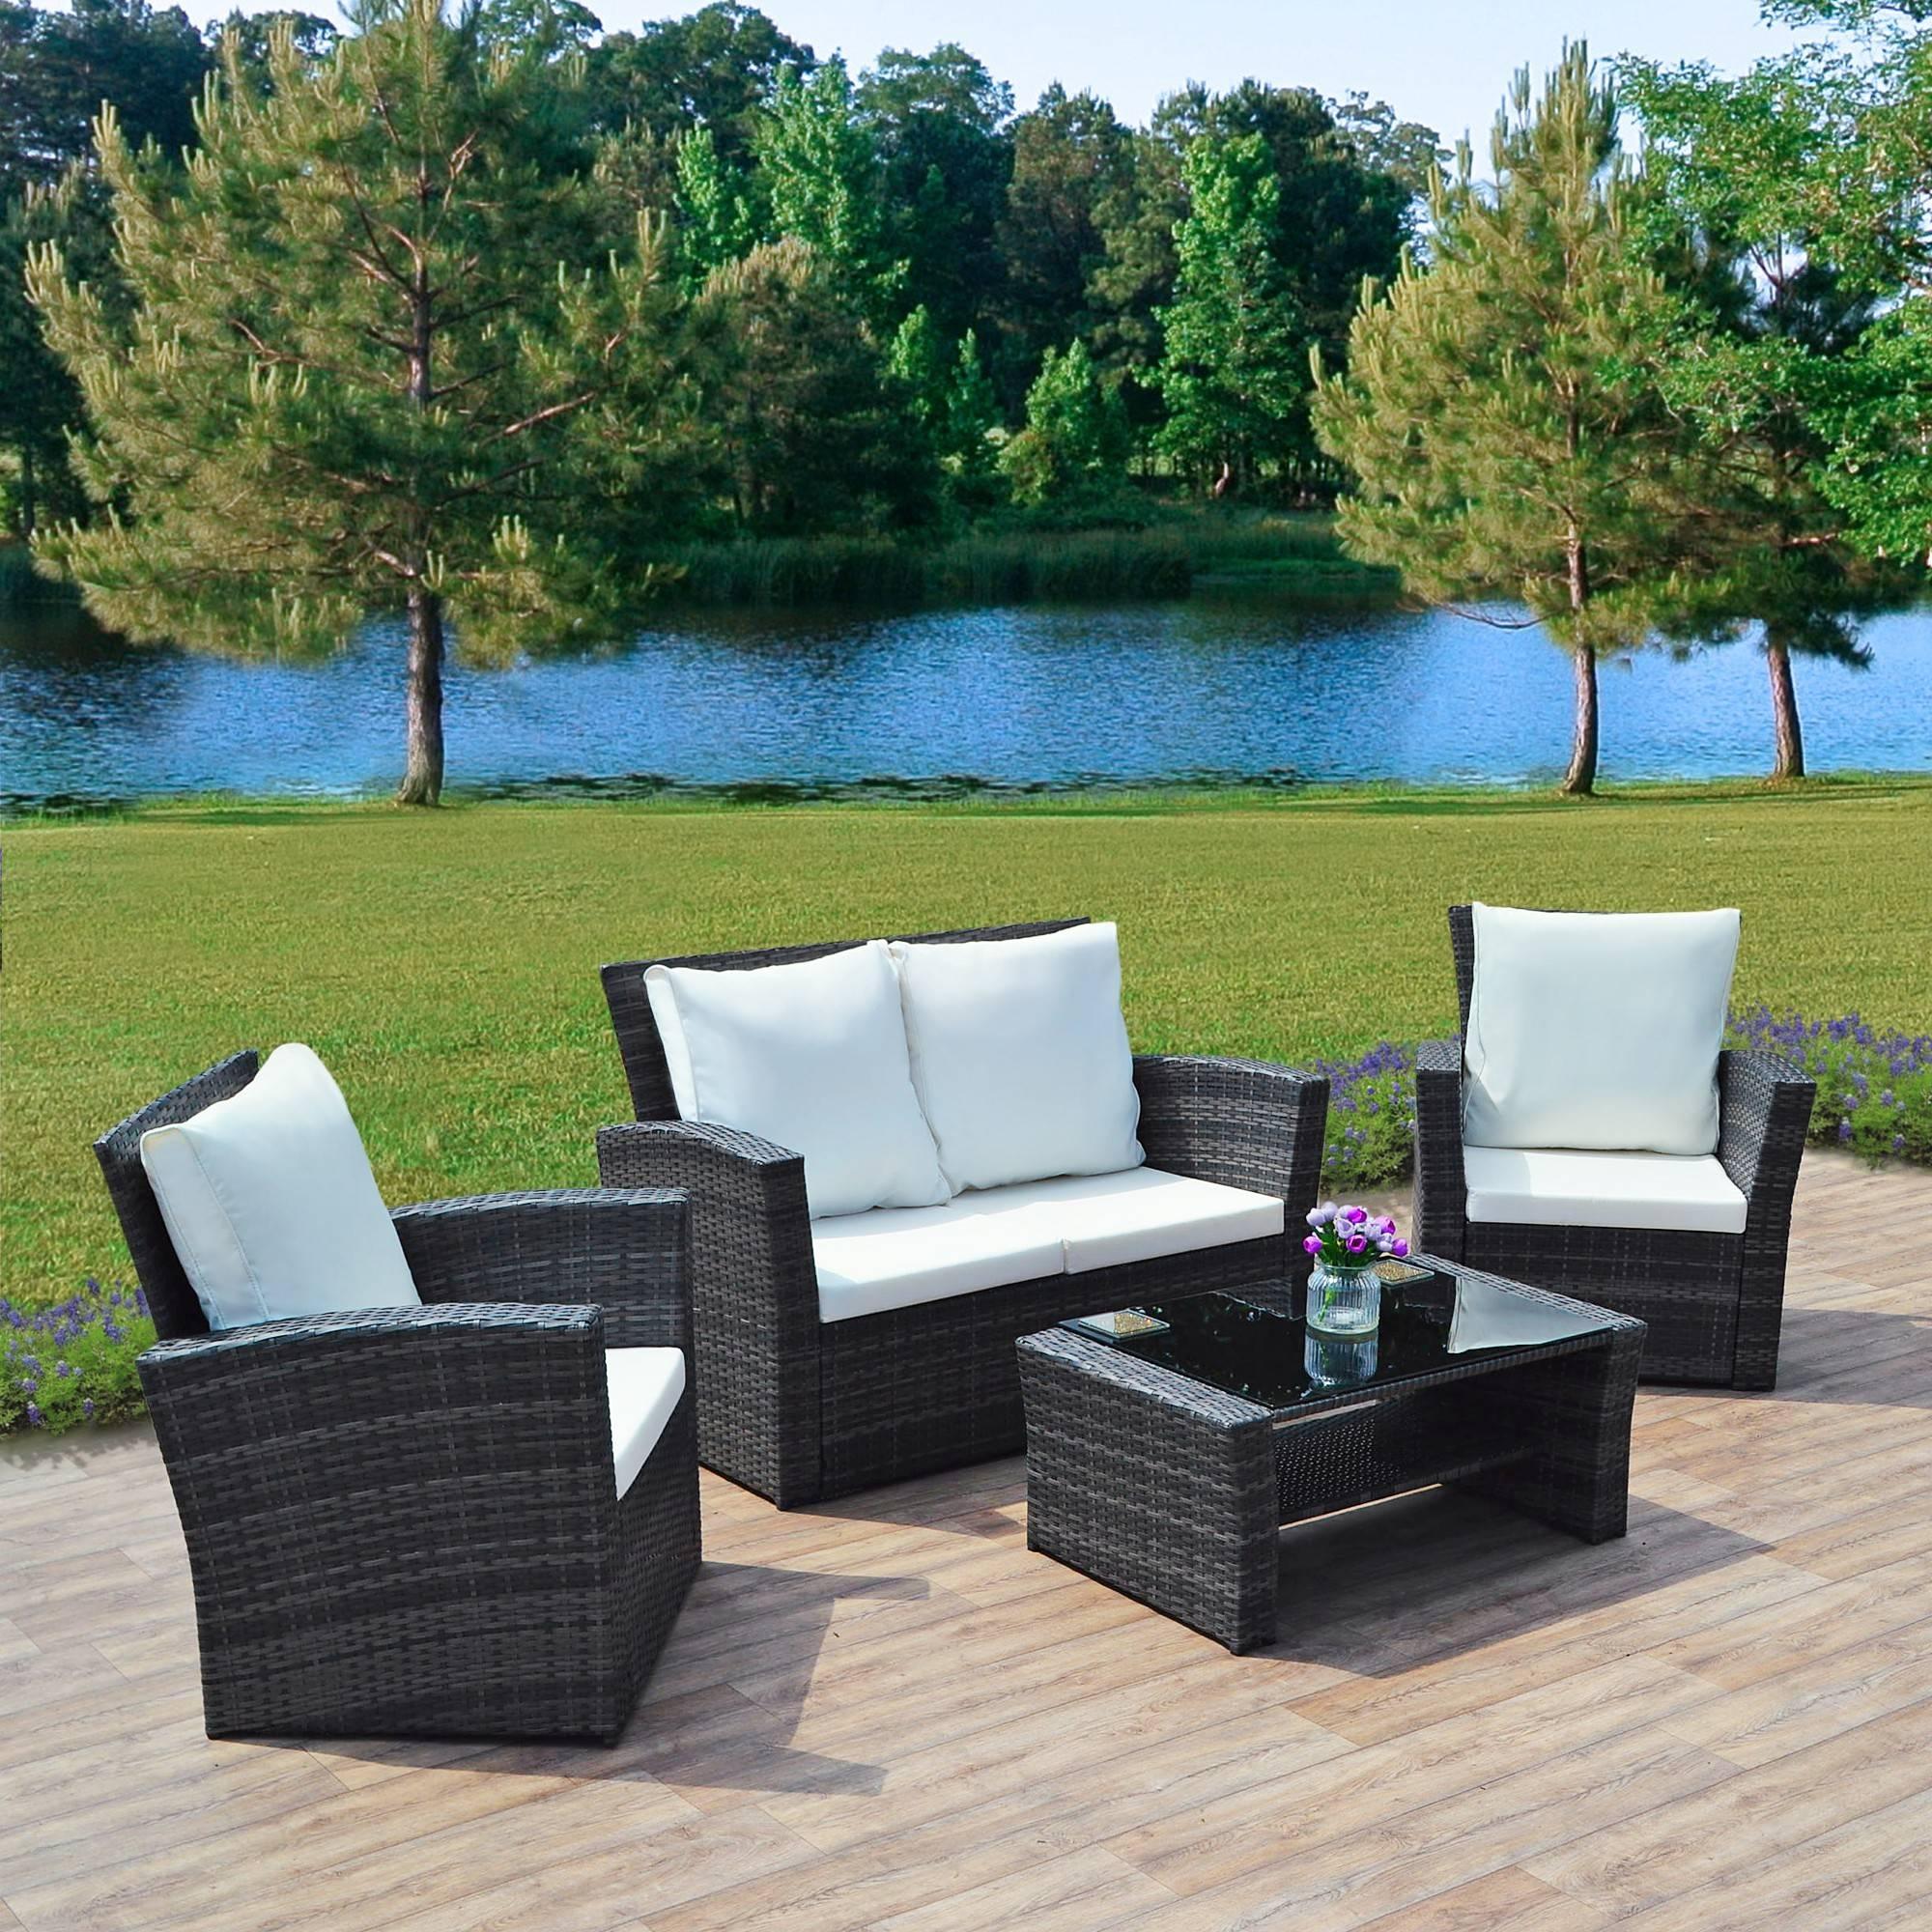 Garden Furniture Rattan Sofa | Roselawnlutheran throughout Garden Sofa Covers (Image 14 of 26)